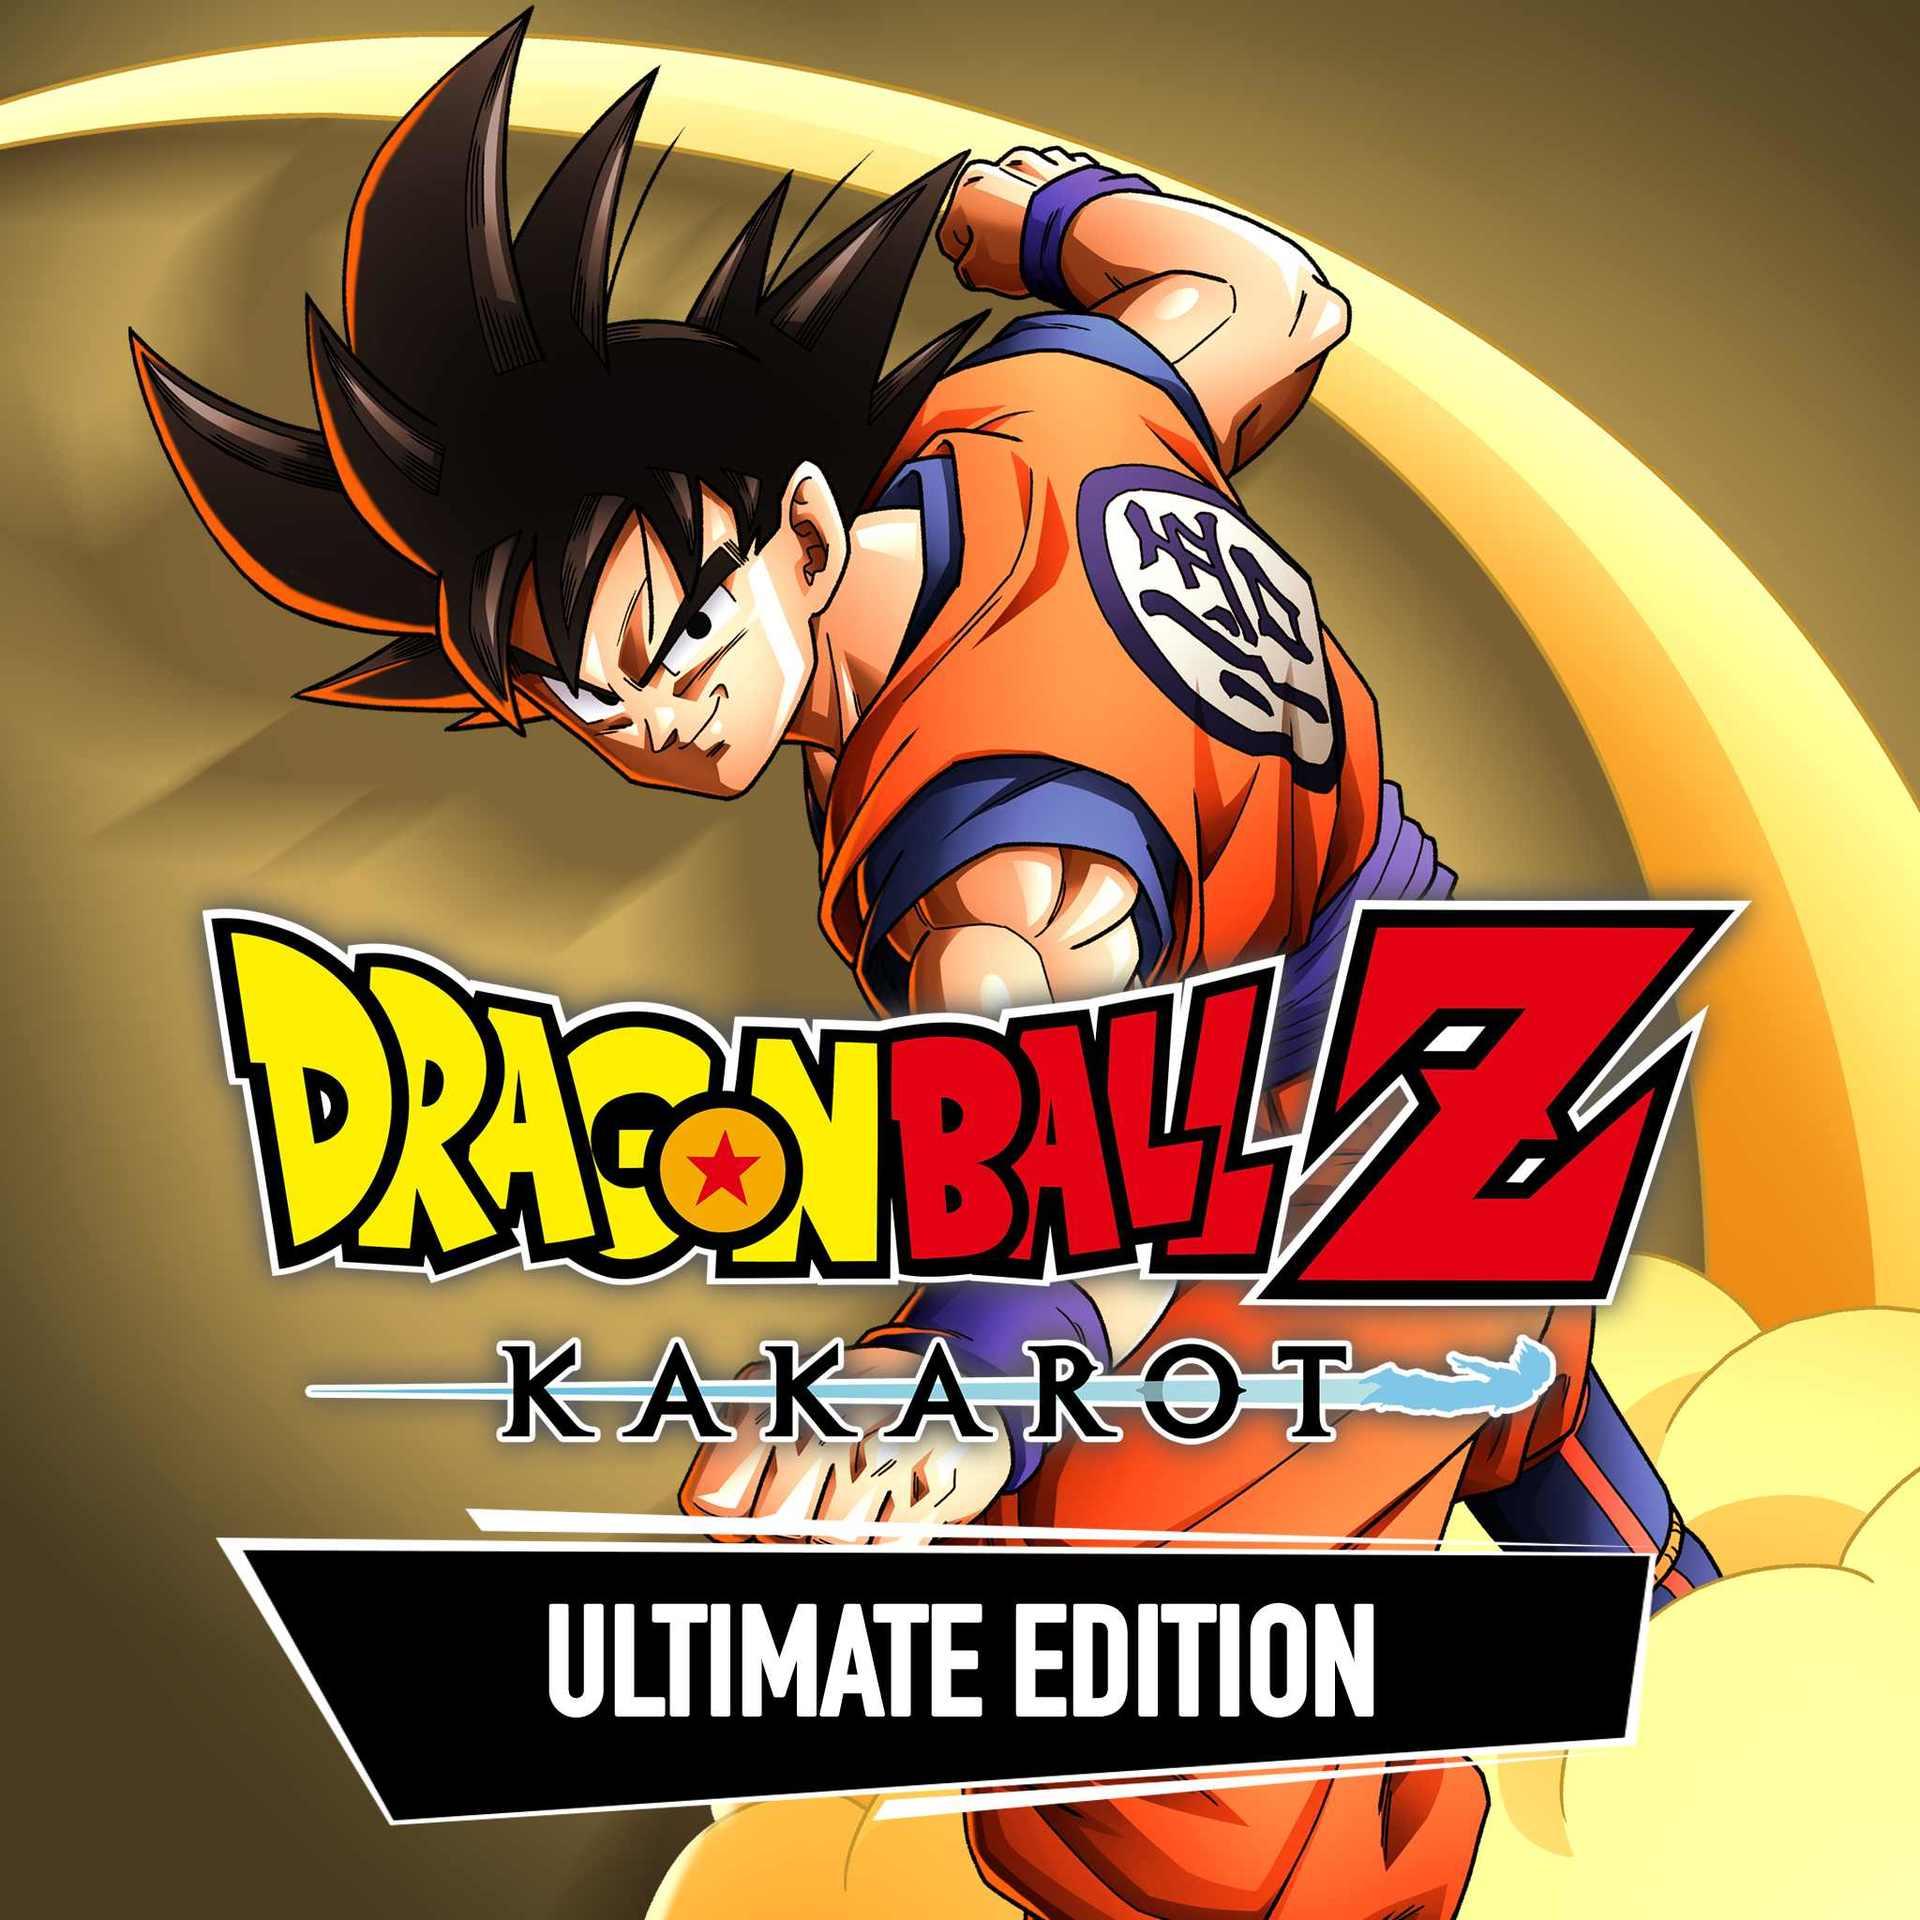 DRAGON BALL Z: KAKAROT - Ultimate Edition (PC) Klíč Steam (PC)